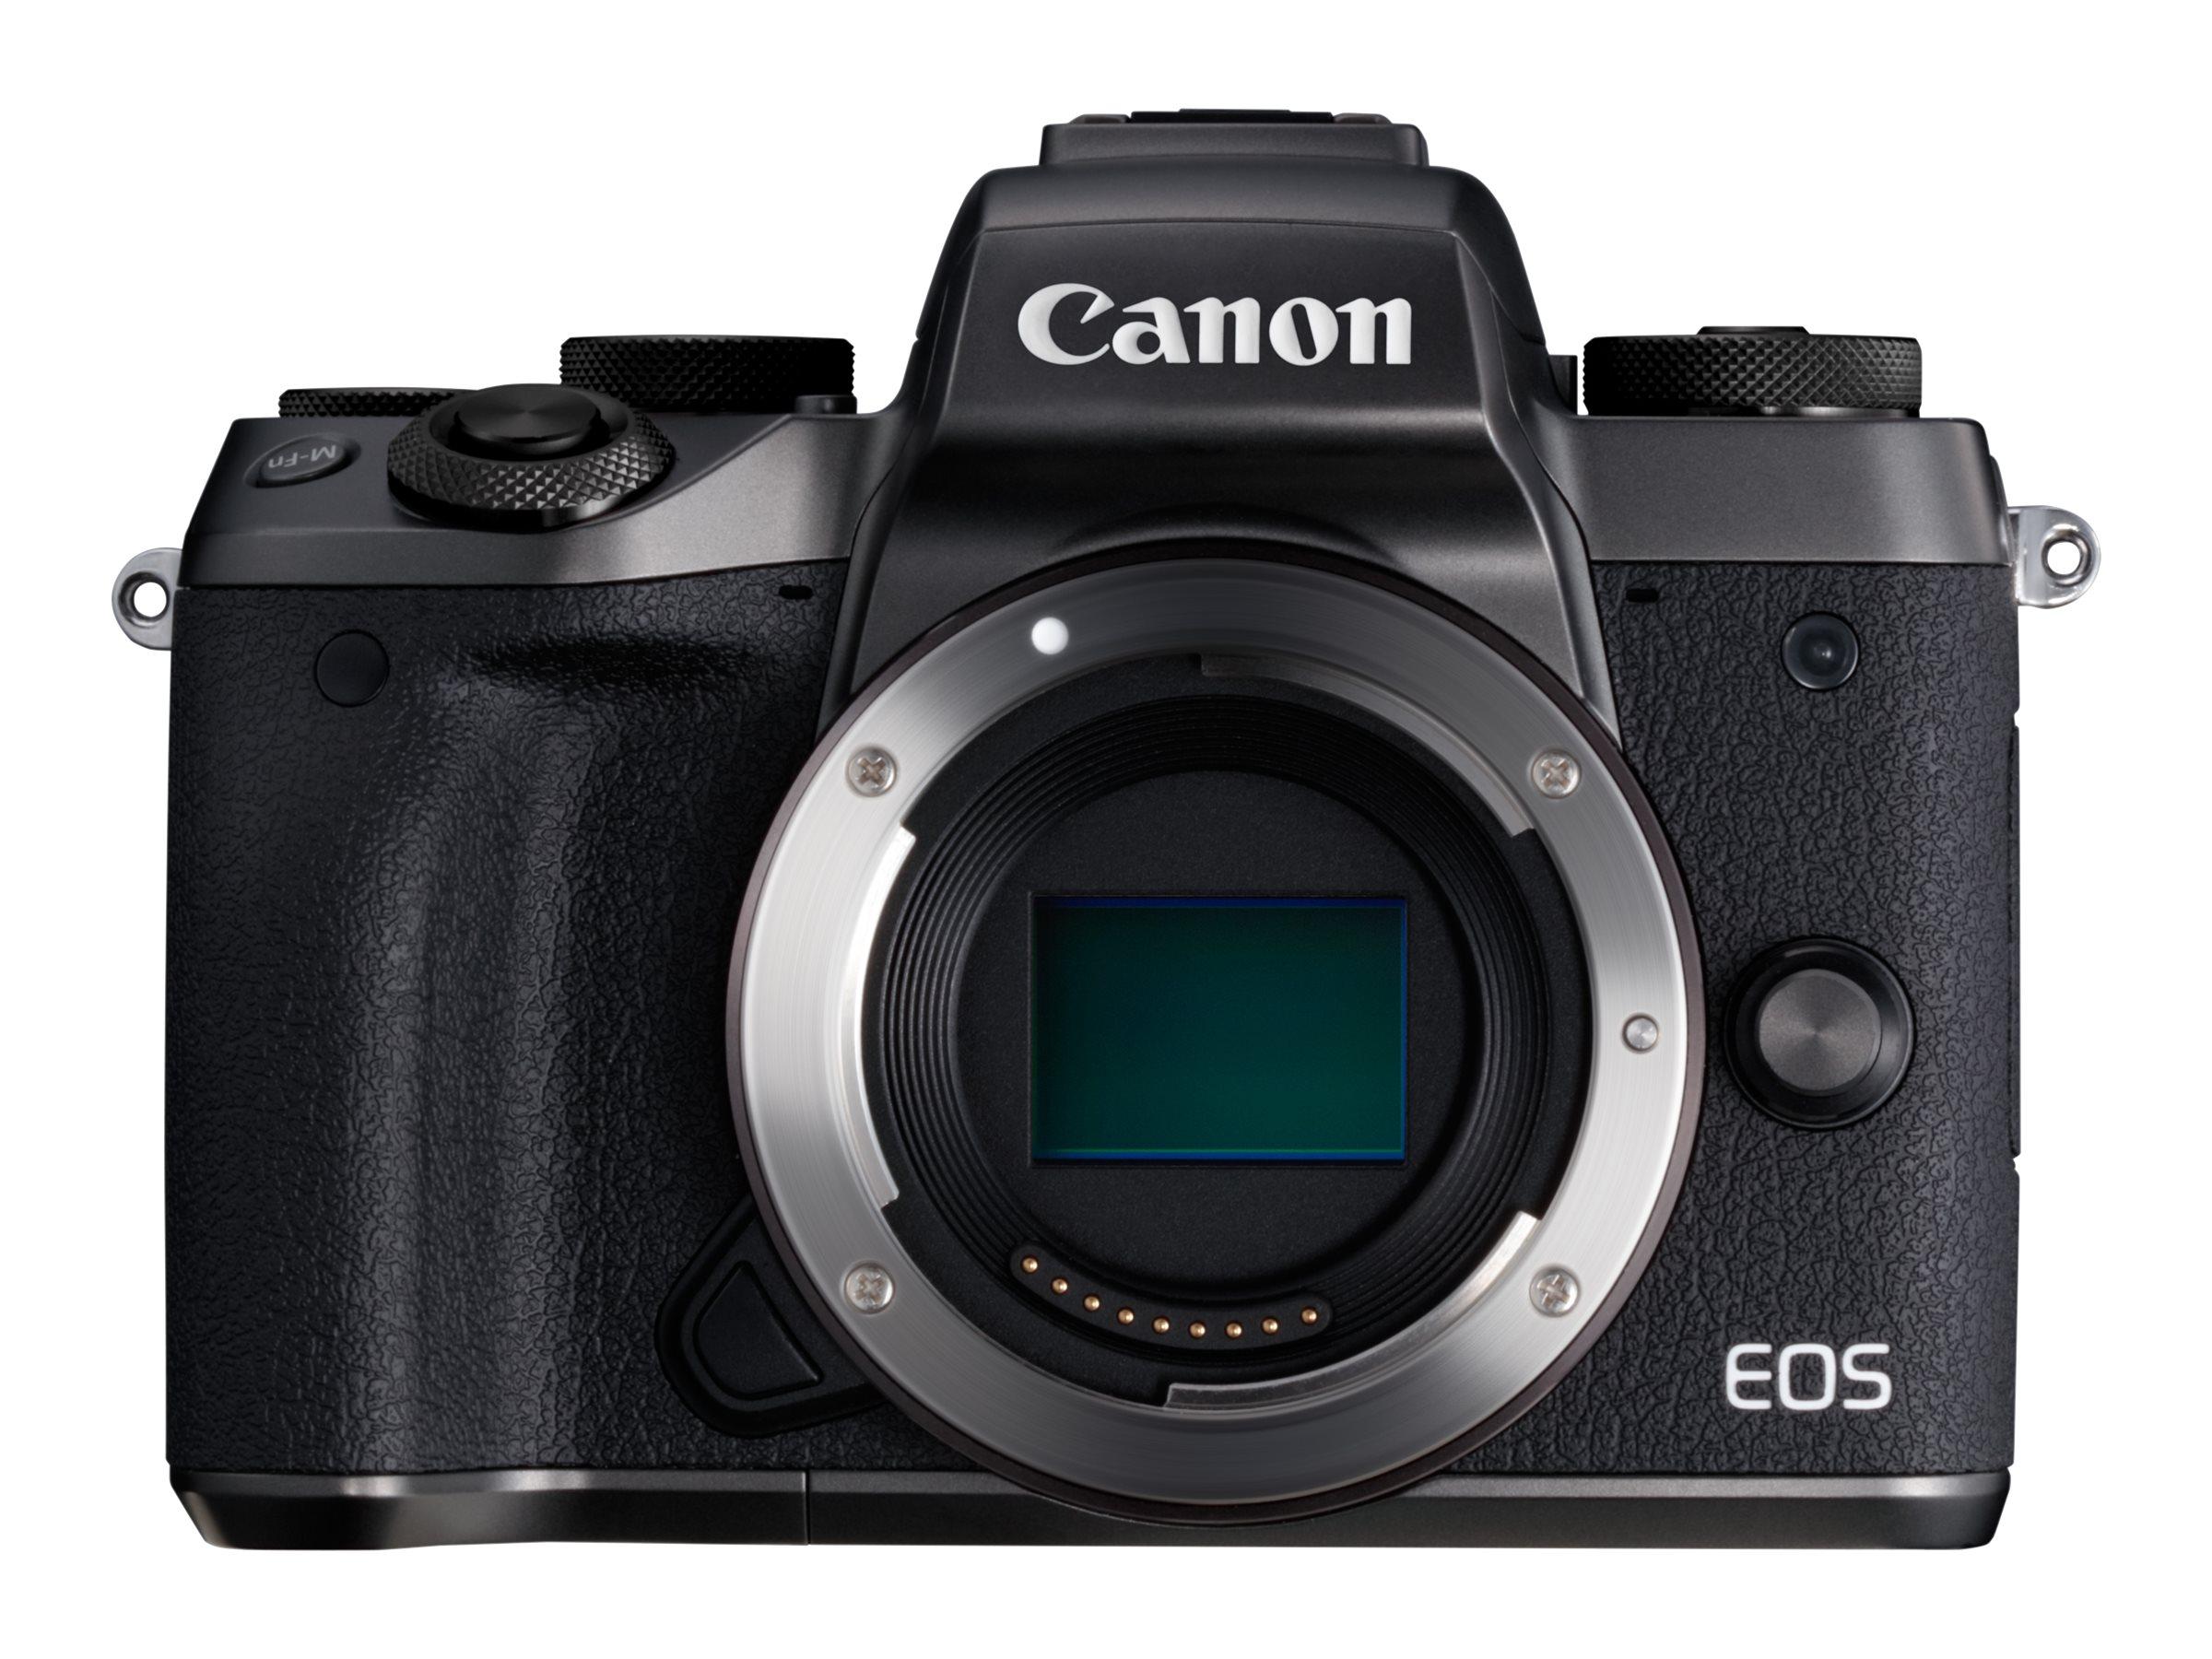 Canon EOS M5 - Digitalkamera - spiegellos - 24.2 MPix - APS-C - 1080p / 60 BpS